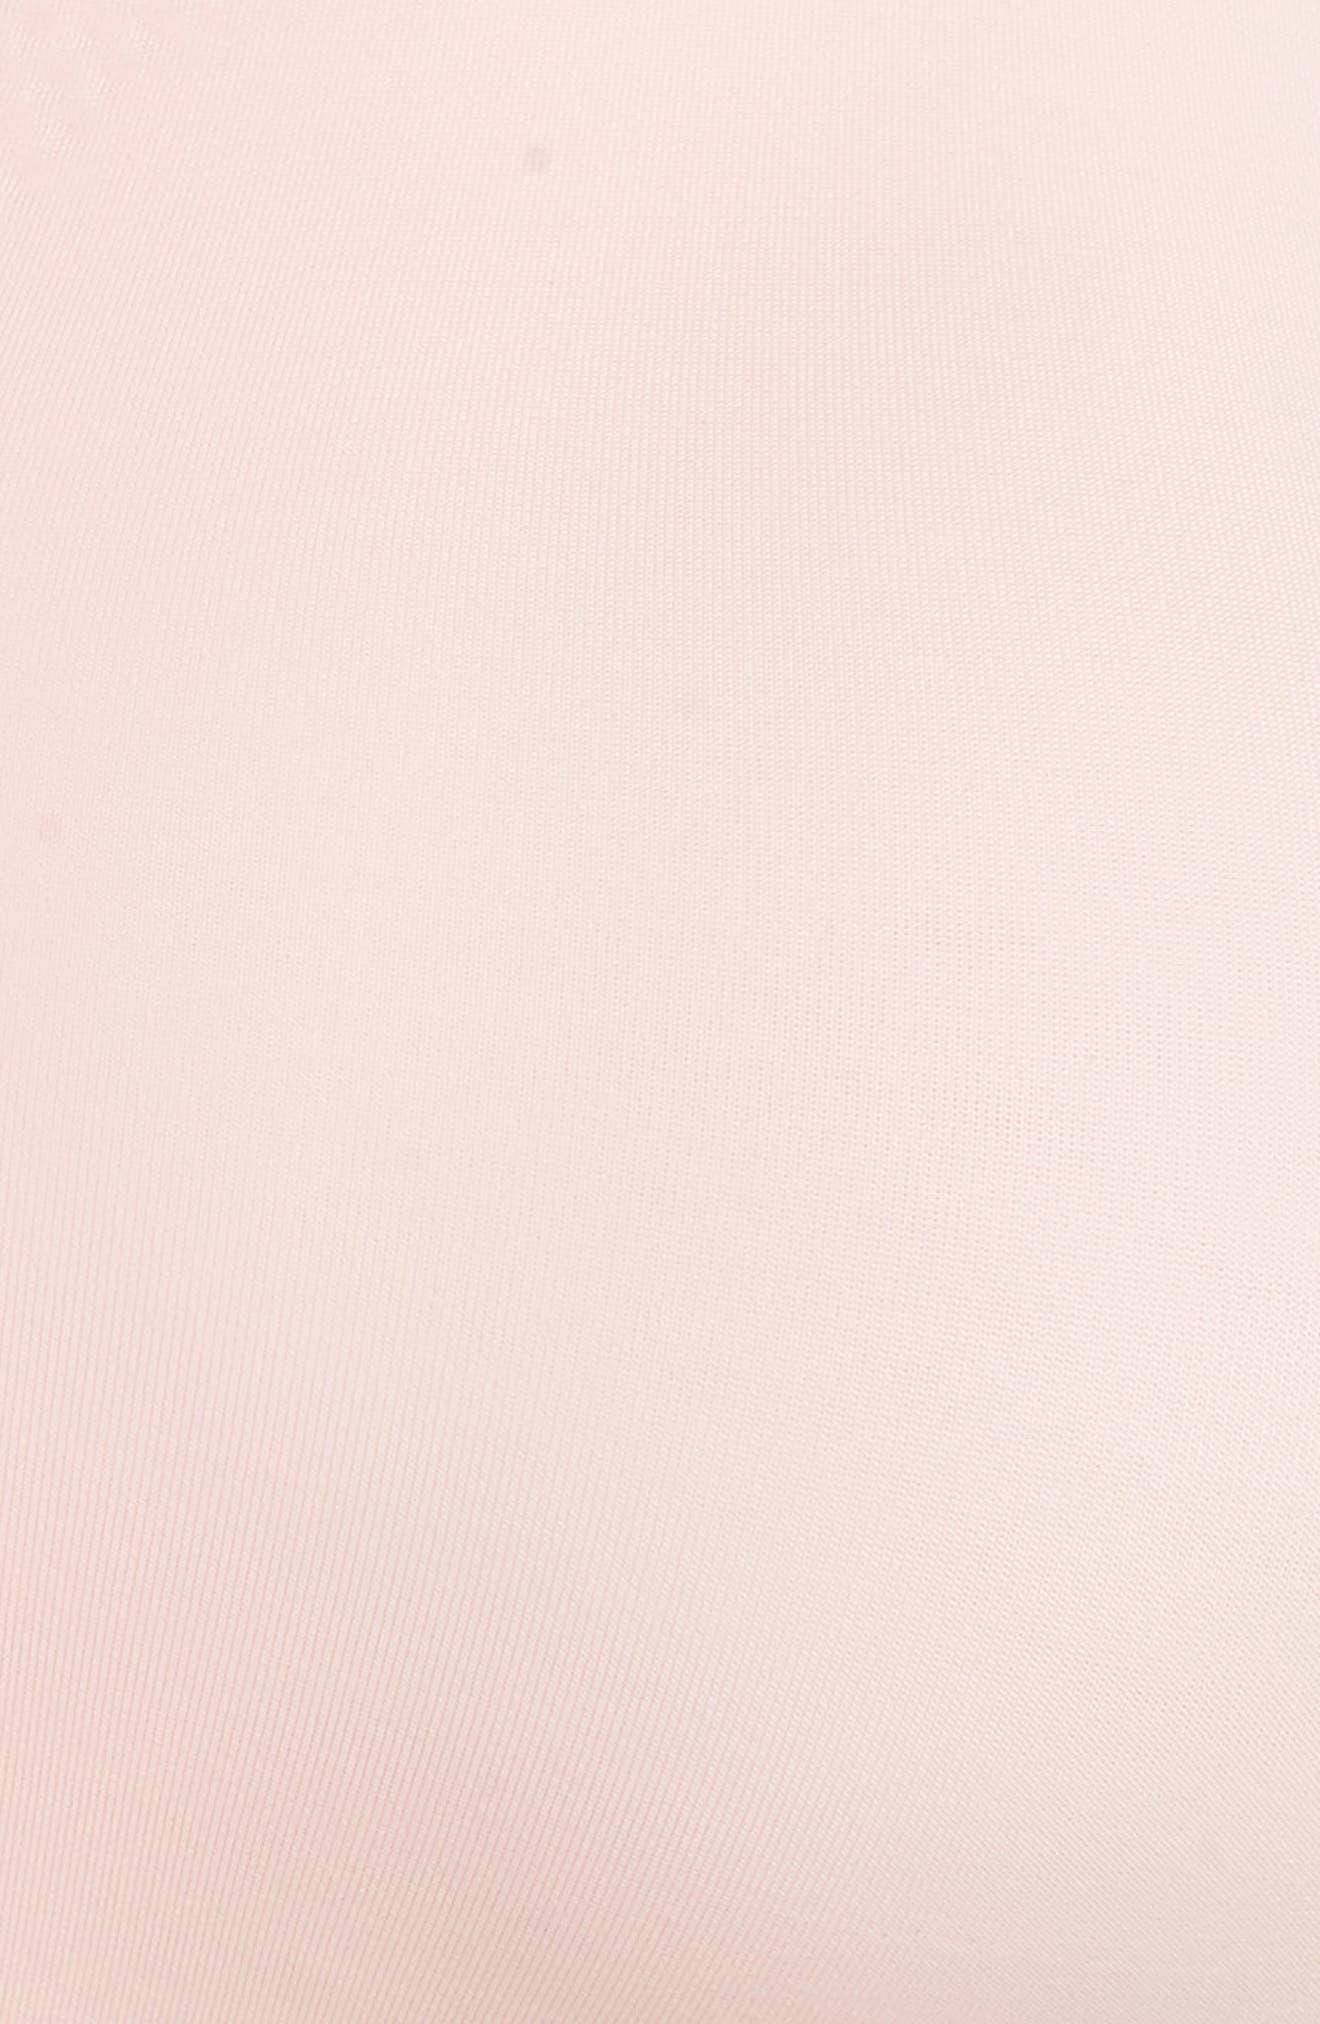 True & Co. True Body Lift Wireless Bra,                             Alternate thumbnail 6, color,                             Retro Pink